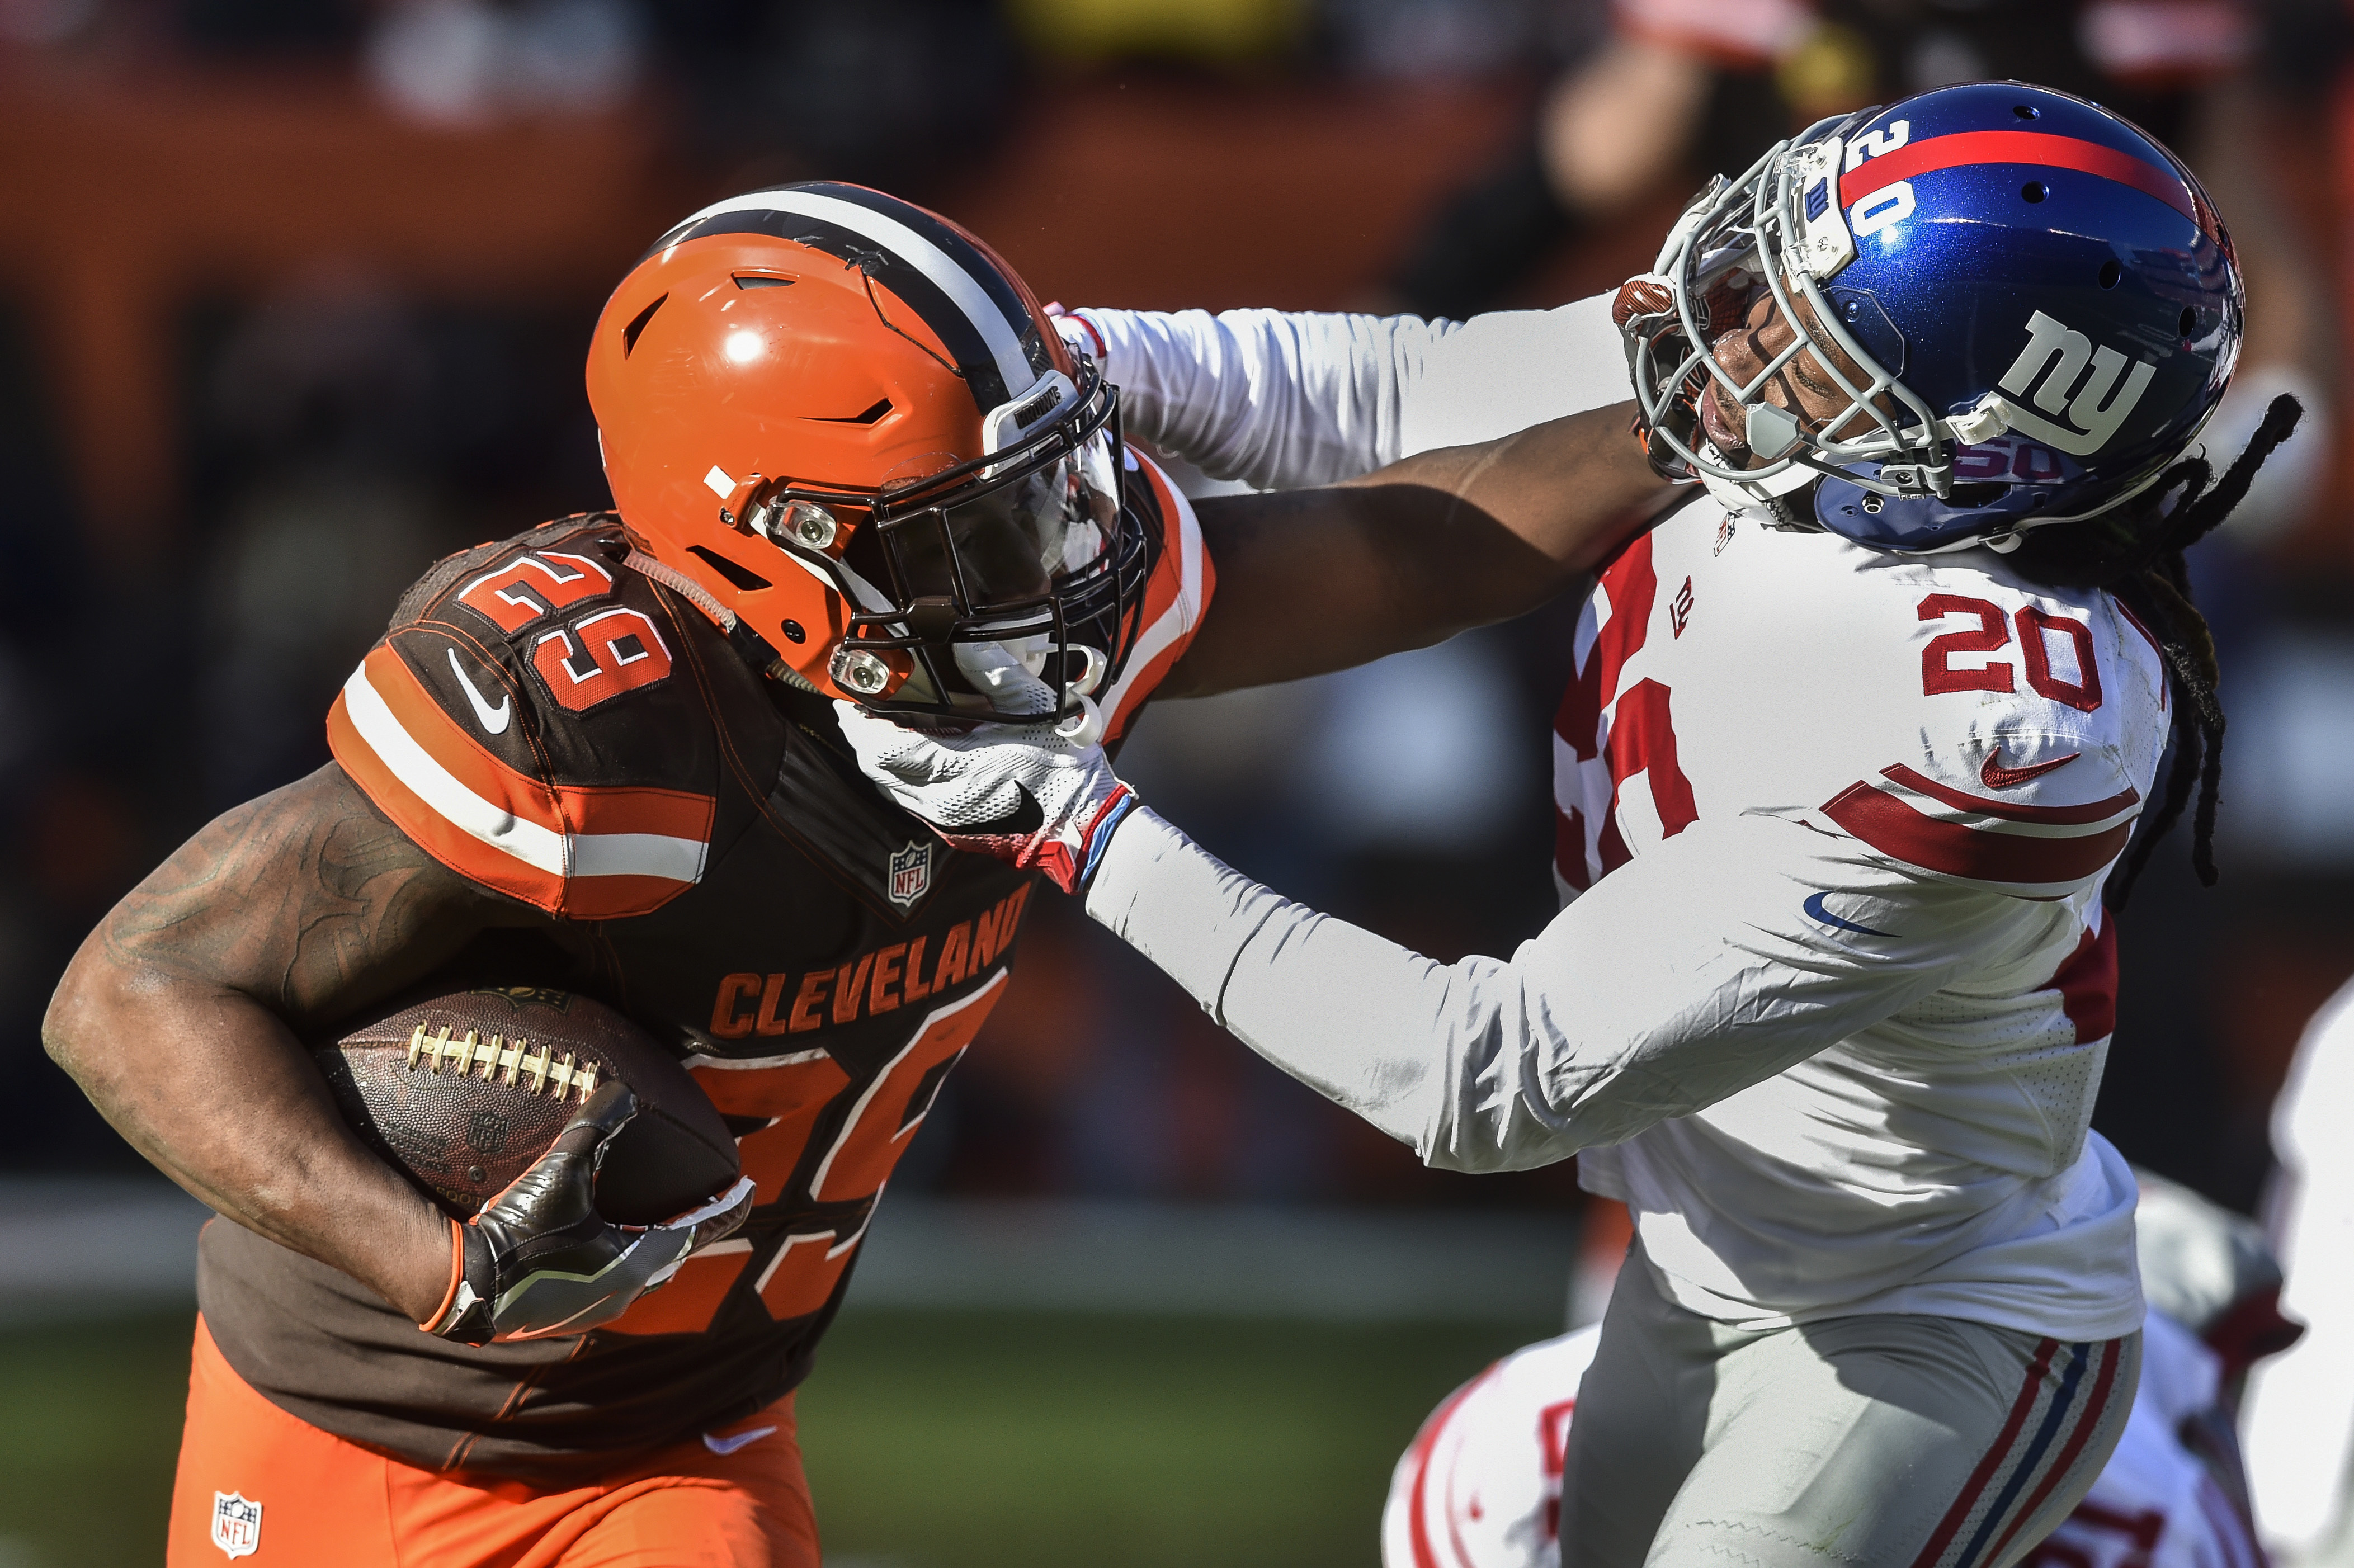 Cleveland Browns running back Duke Johnson (29) runs the ball against New York Giants cornerback Janoris Jenkins (20) in the first half of an NFL football game, Sunday, Nov. 27, 2016, in Cleveland. (AP Photo/David Richard)